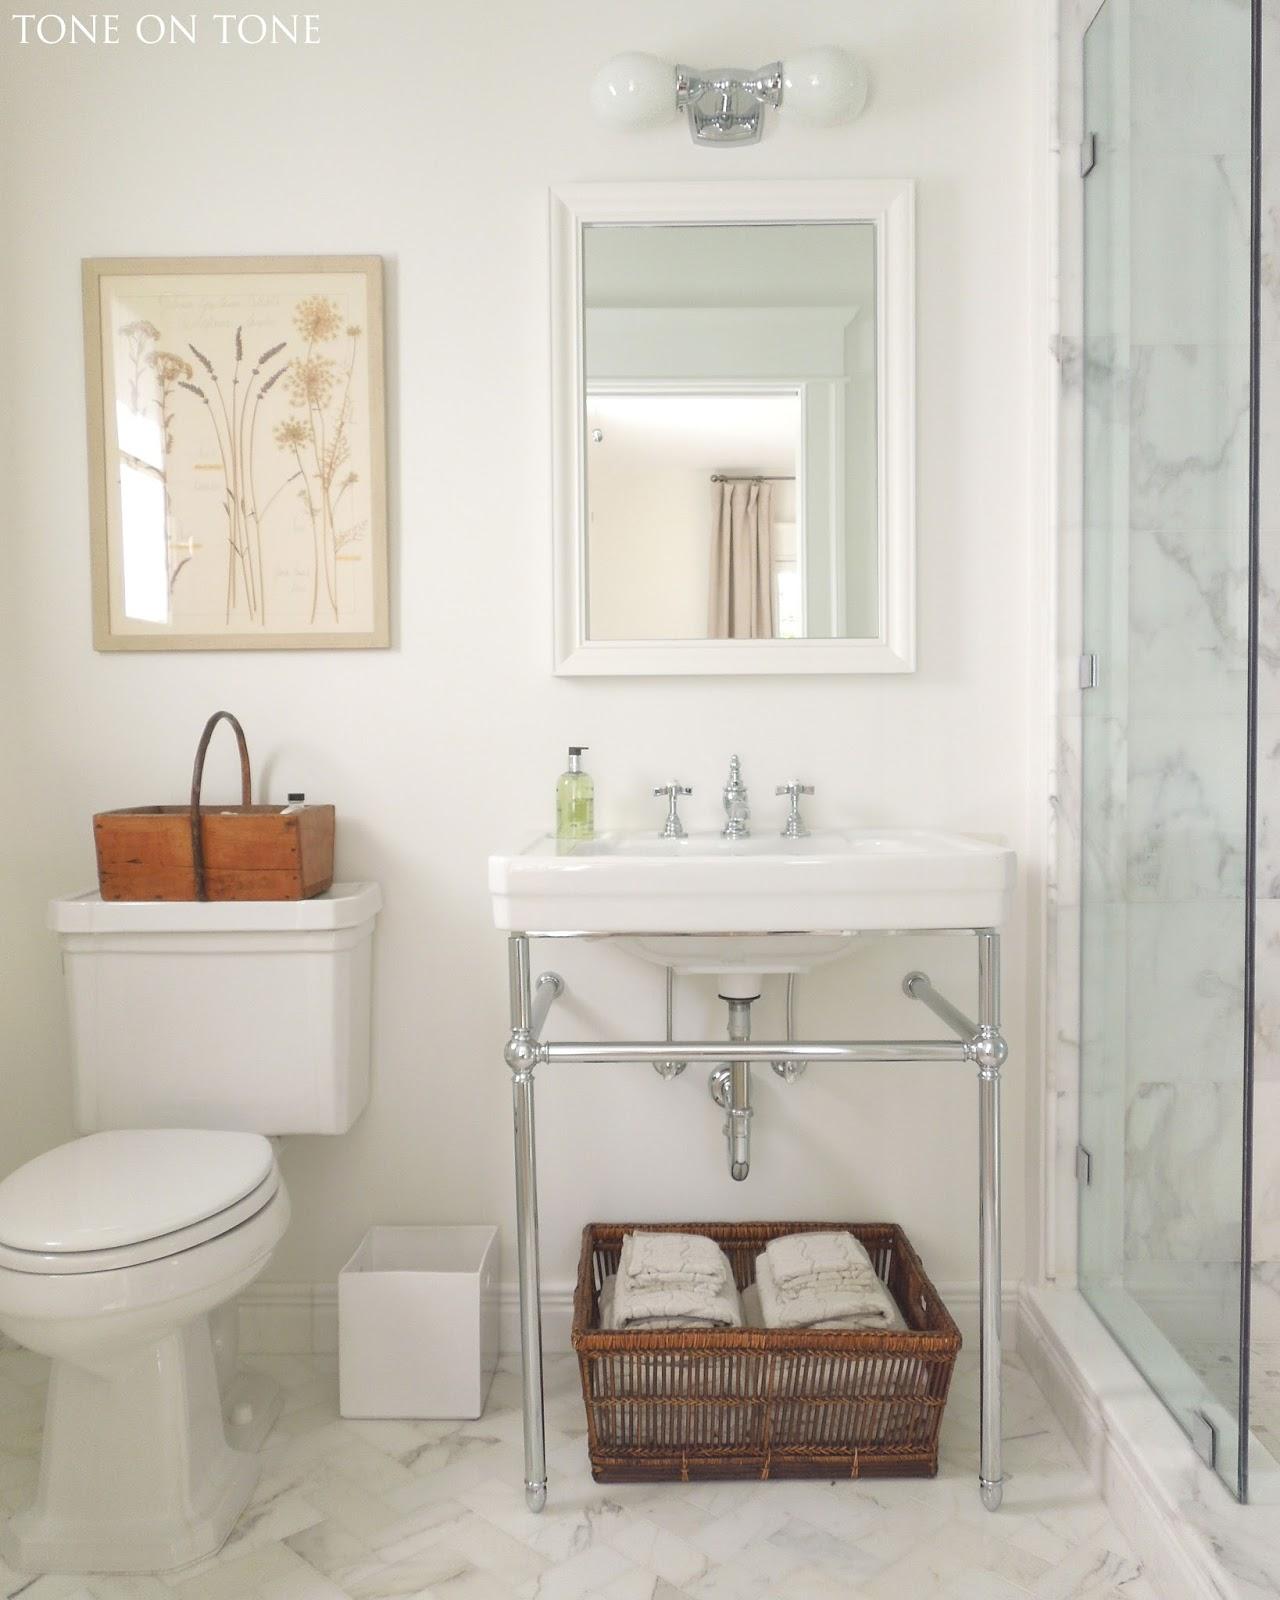 . Tone on Tone   Interior   Garden Design  Small Bathroom Renovation